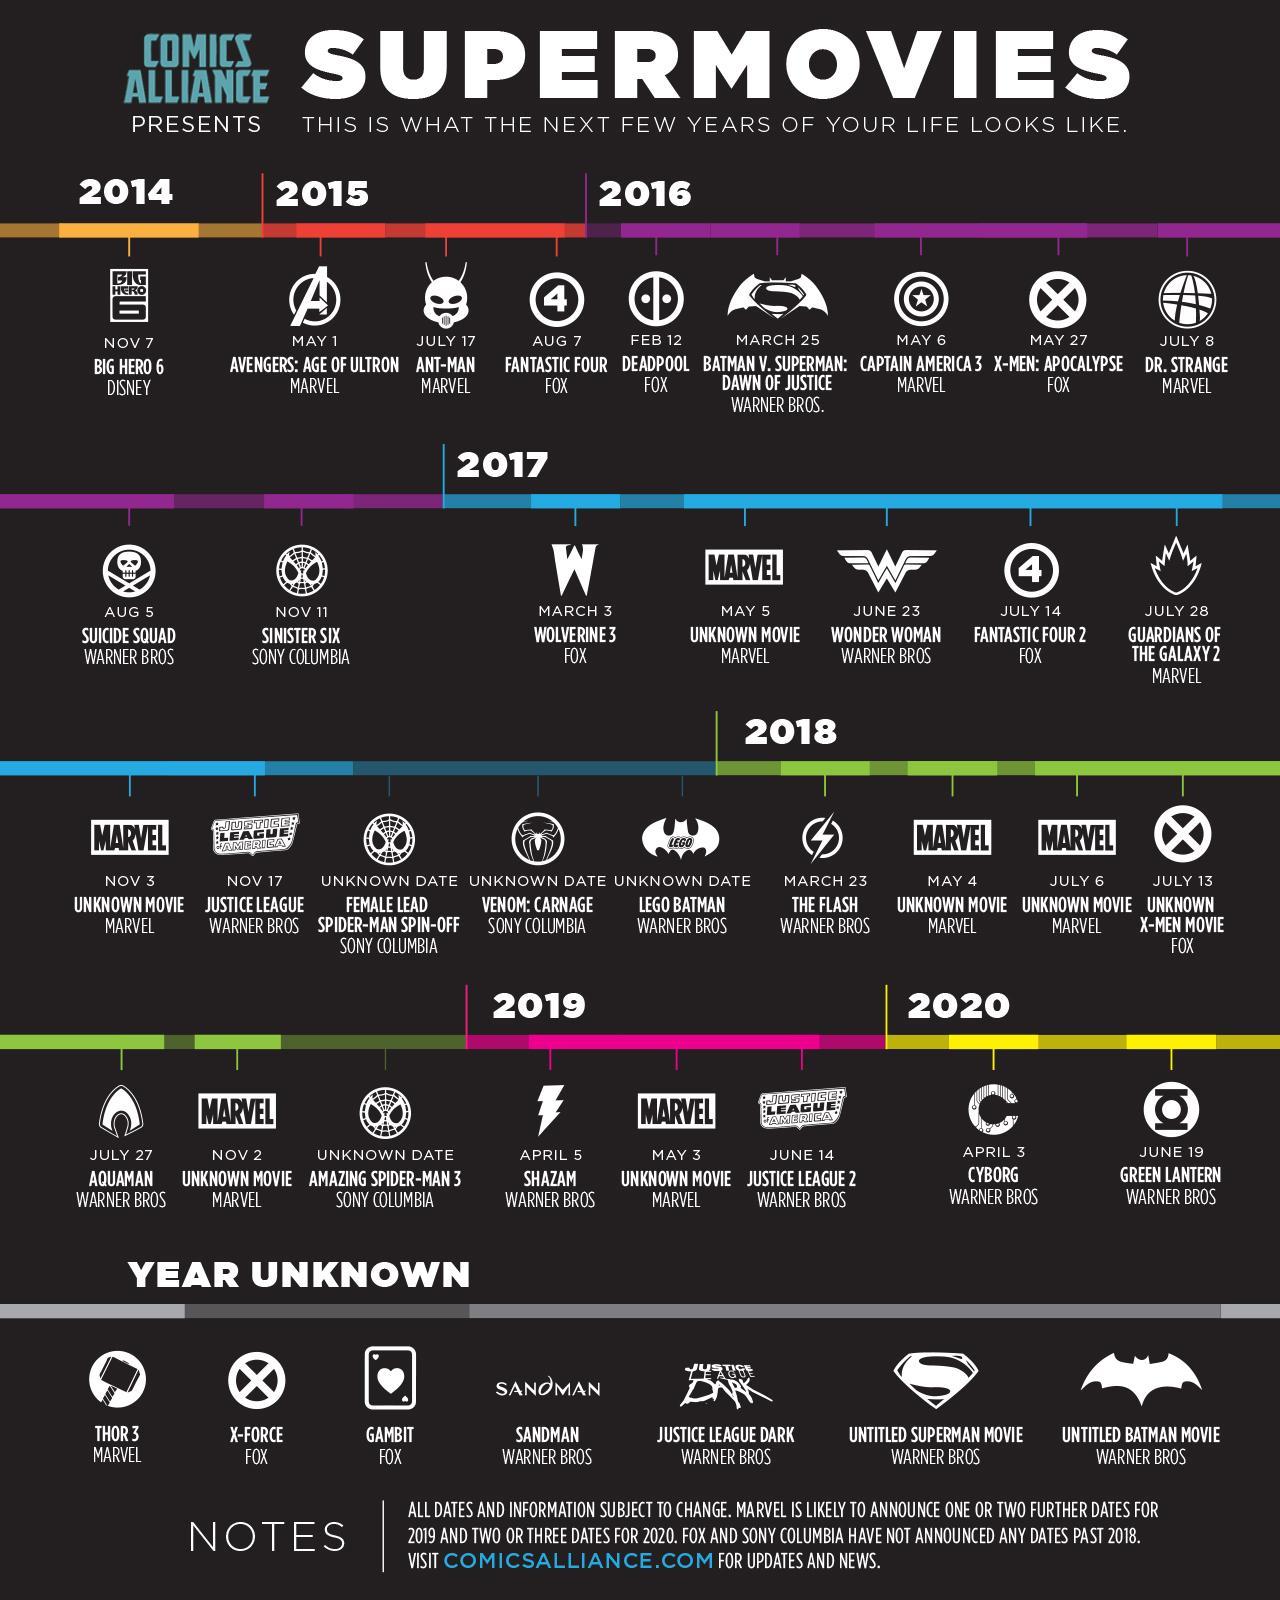 RT @andykhouri: Super cool superhero infographic by @bigredrobot + @Wheeler http://t.co/QA6xaZOuxr